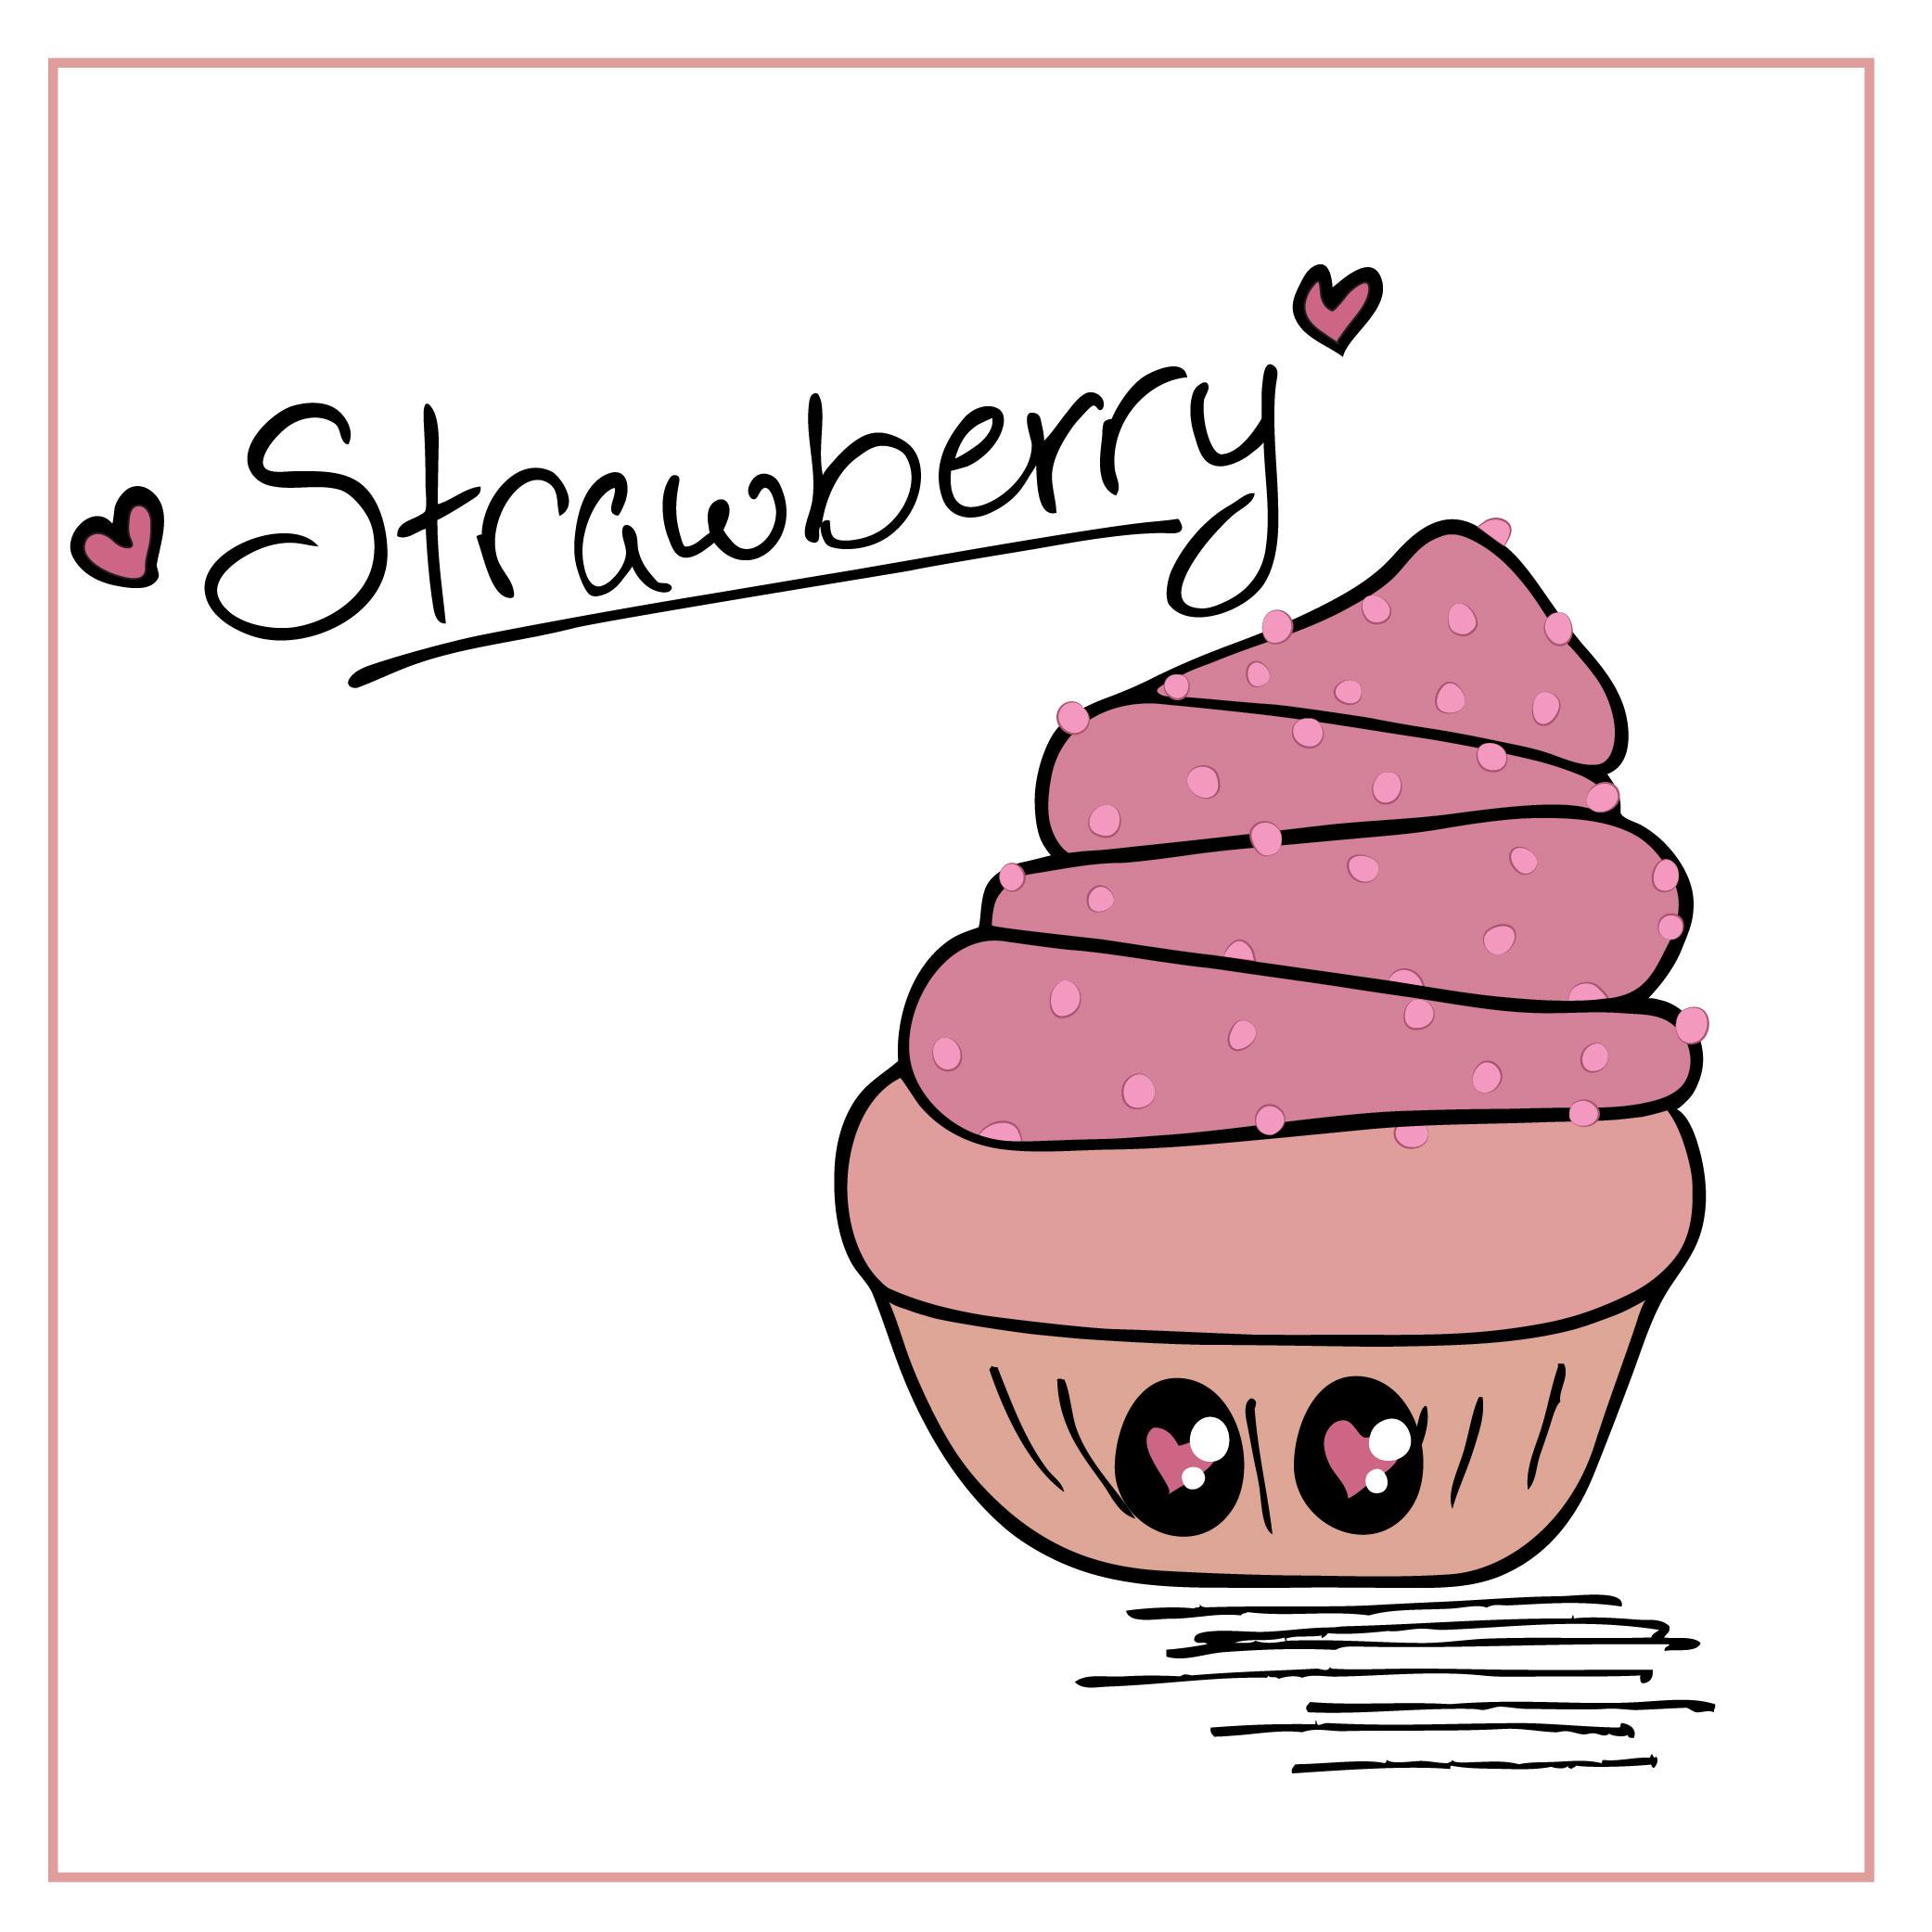 Strawberry-Squared-01.jpg